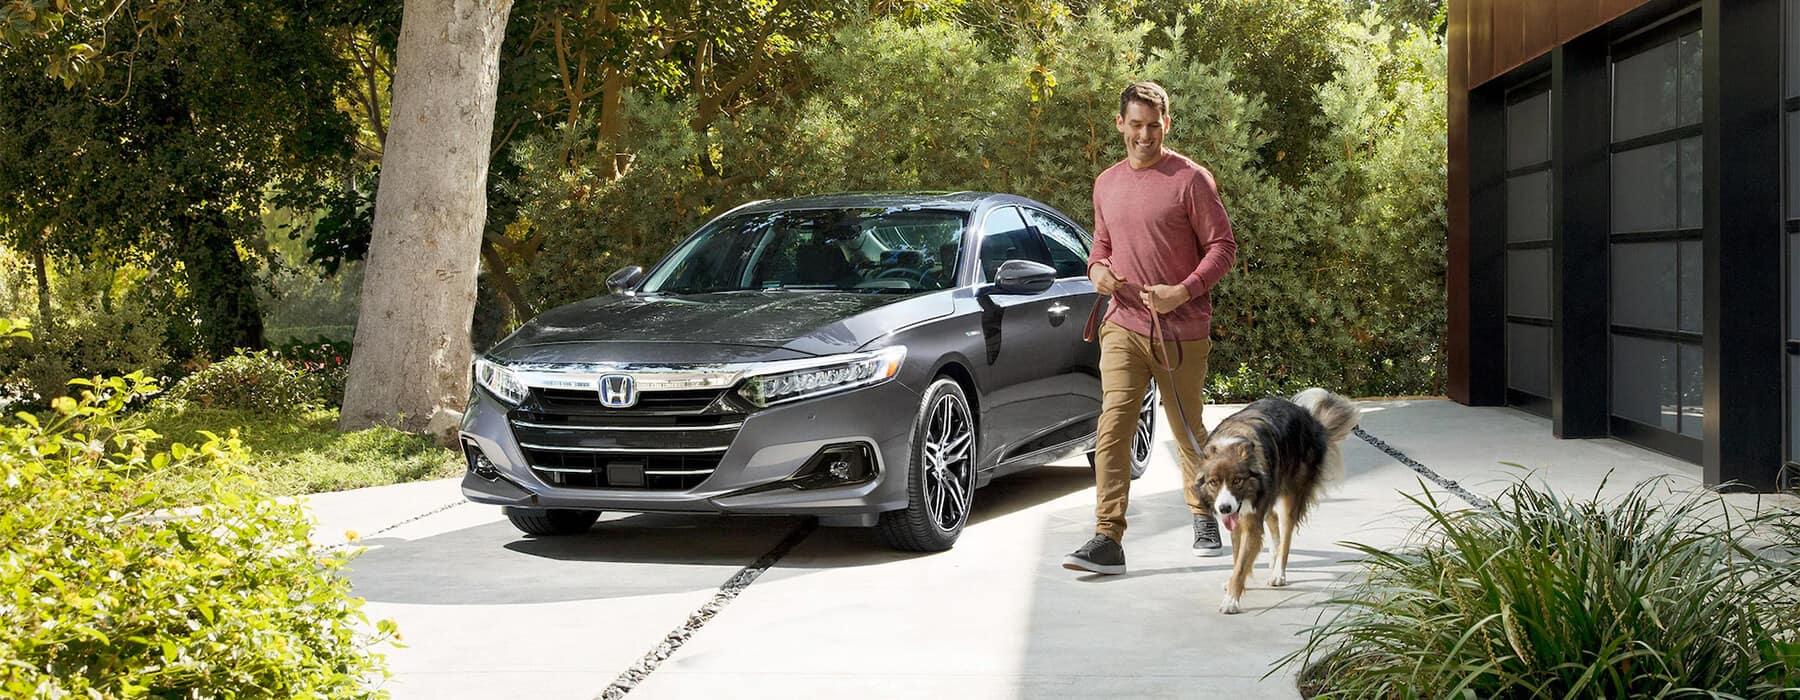 Vern Eide Honda New Car Warranty Slider